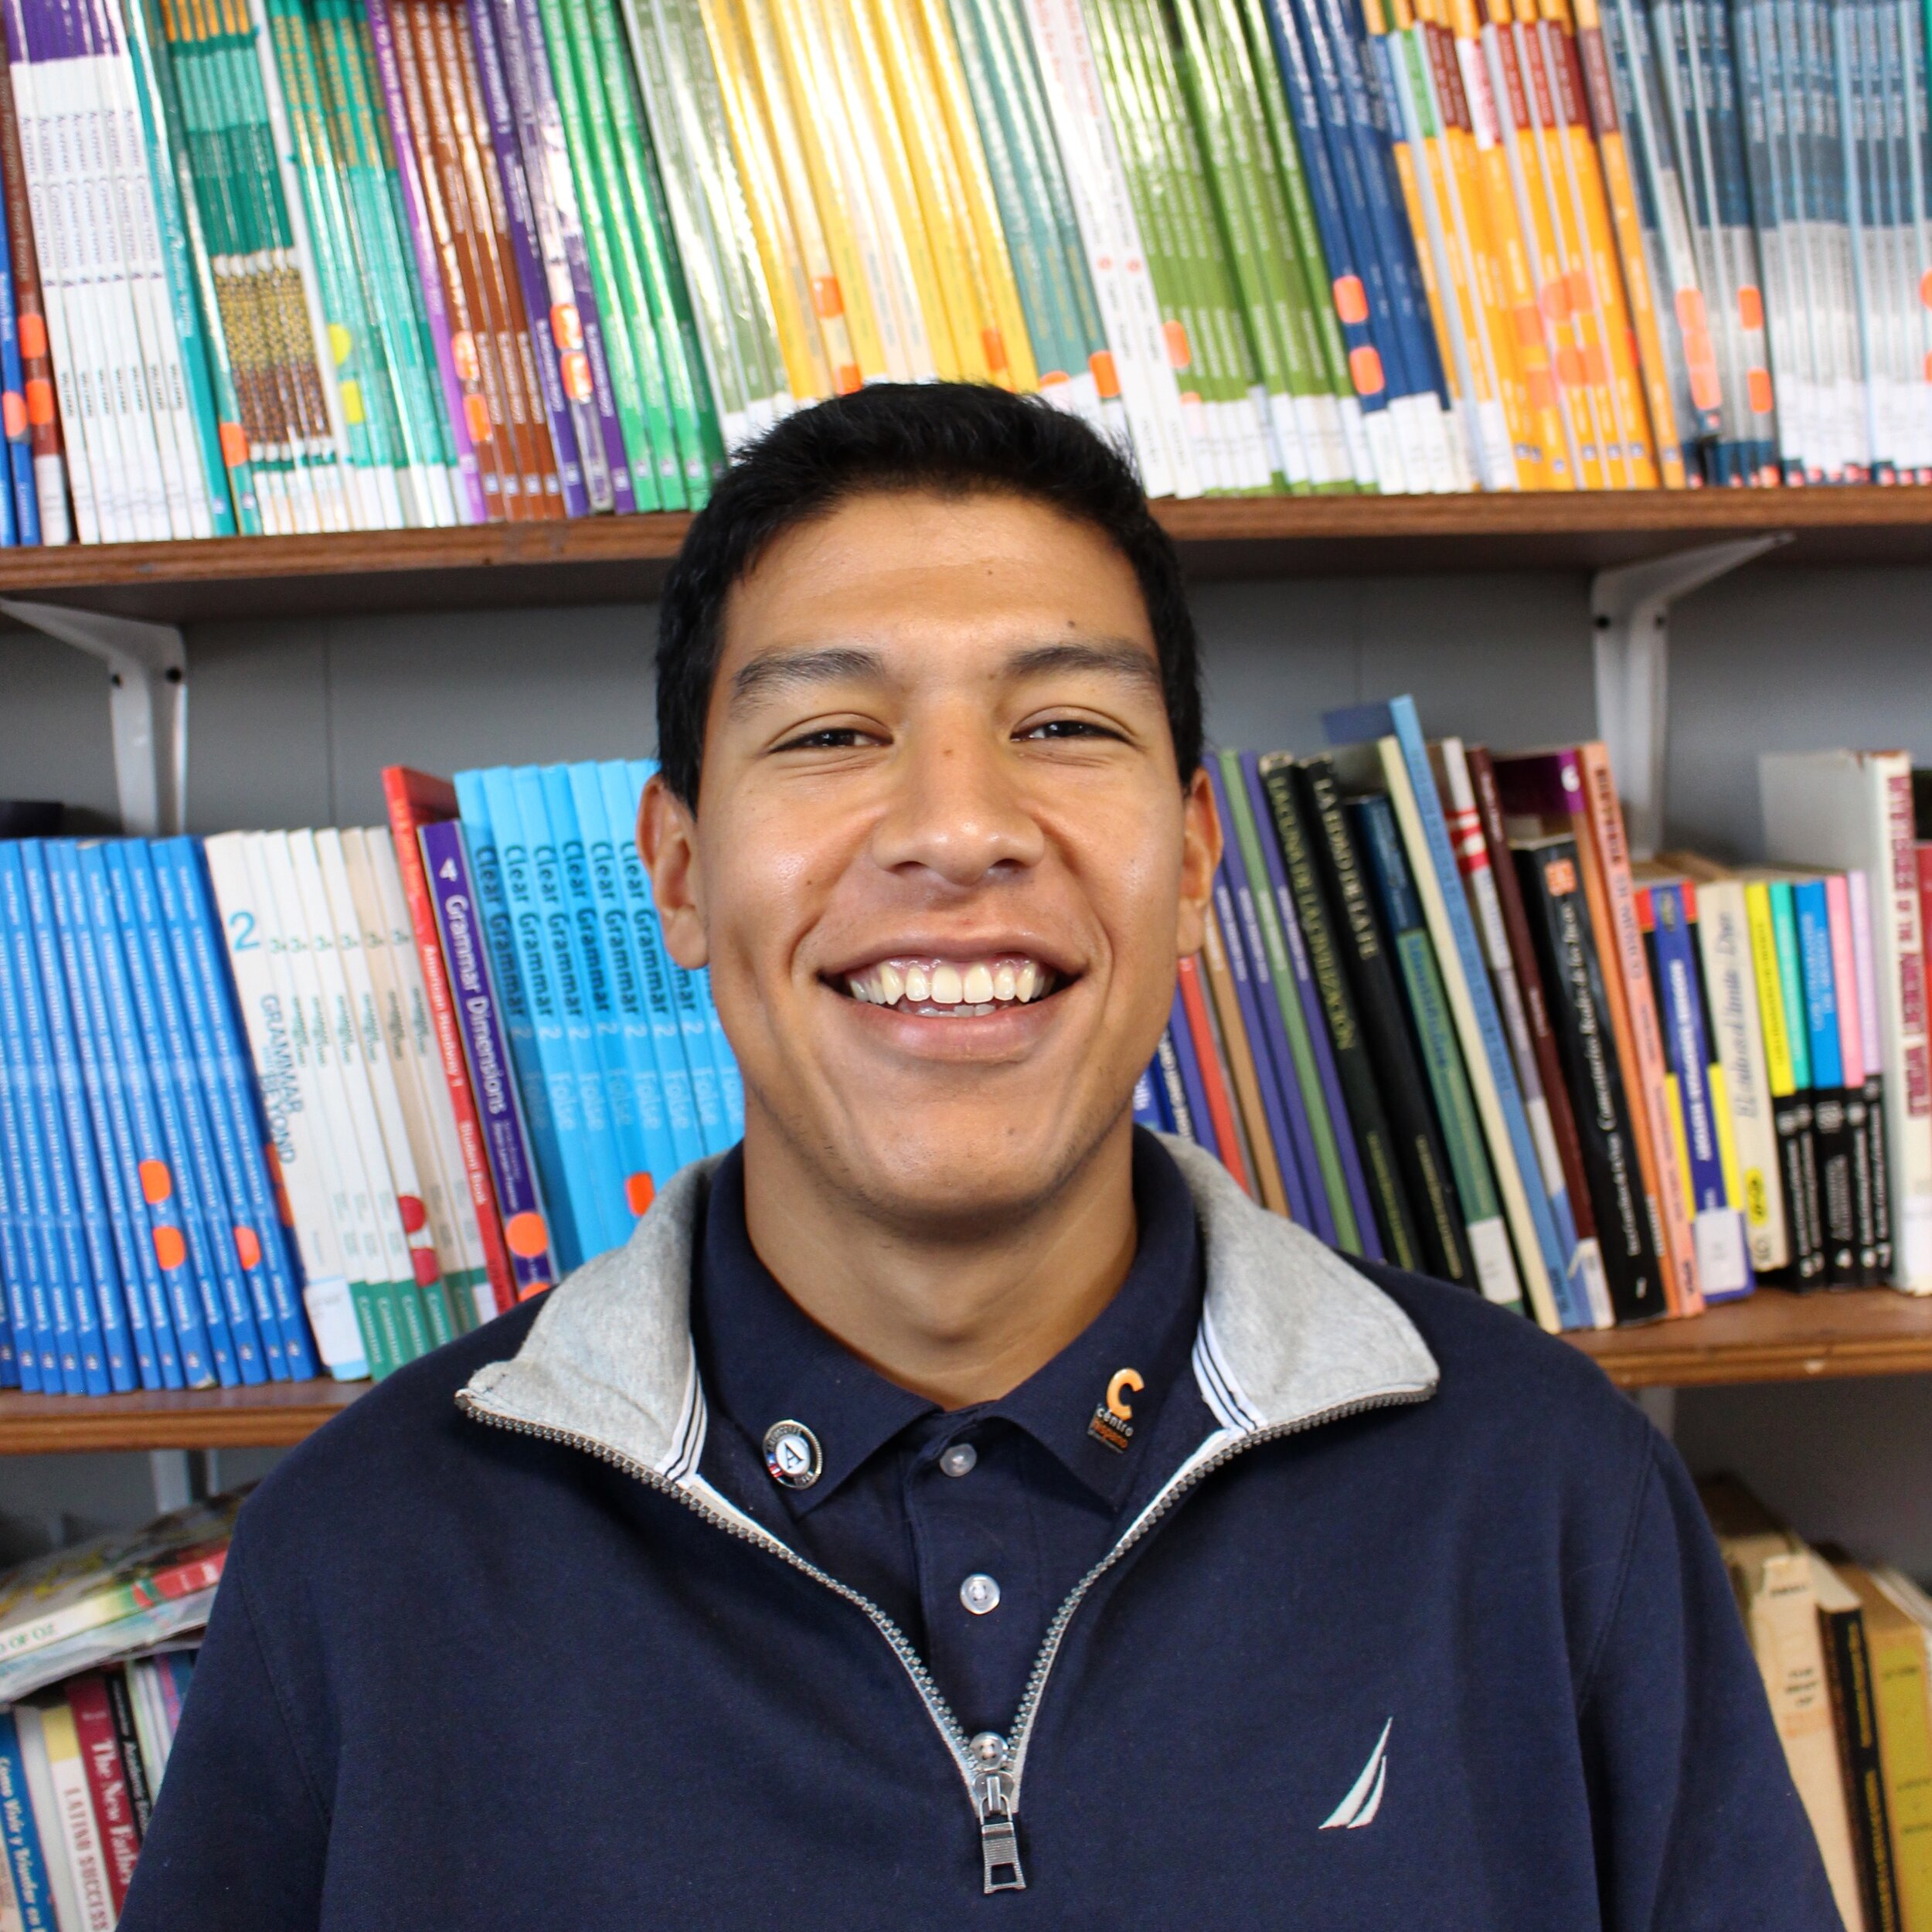 Luis Urrea